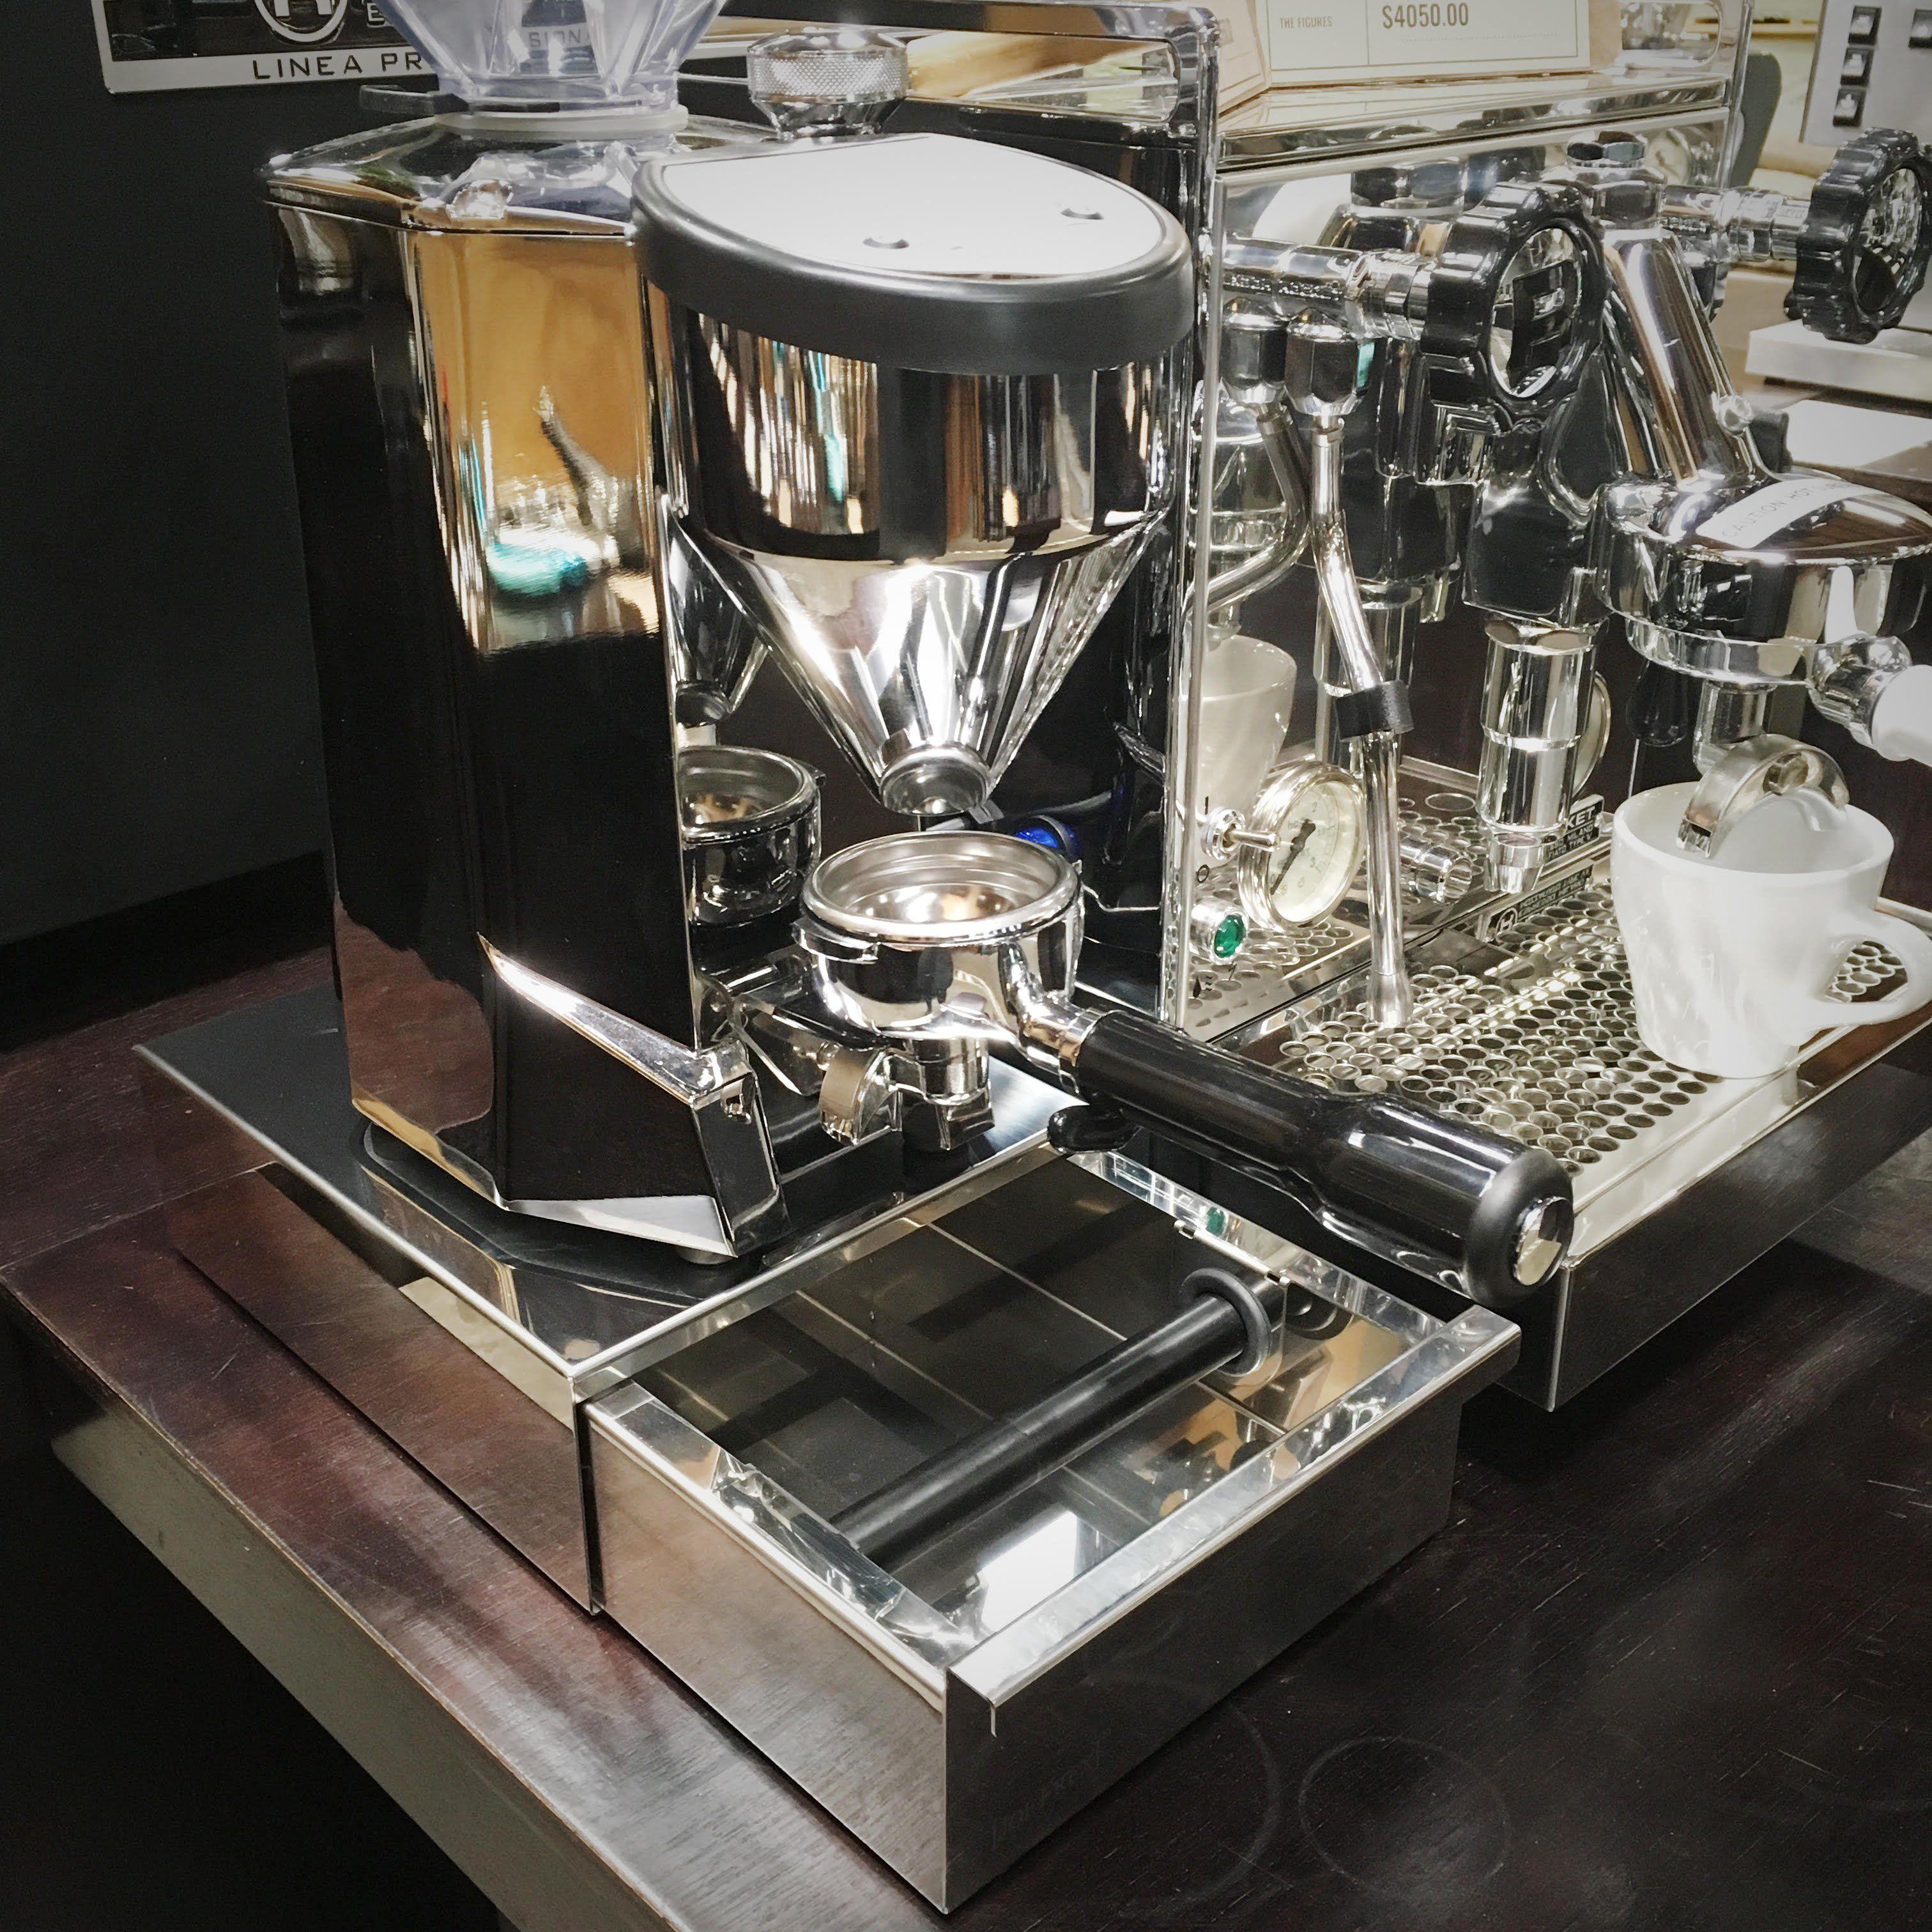 Knock Box Drawer Small Coffee Coffee Machine Drawers